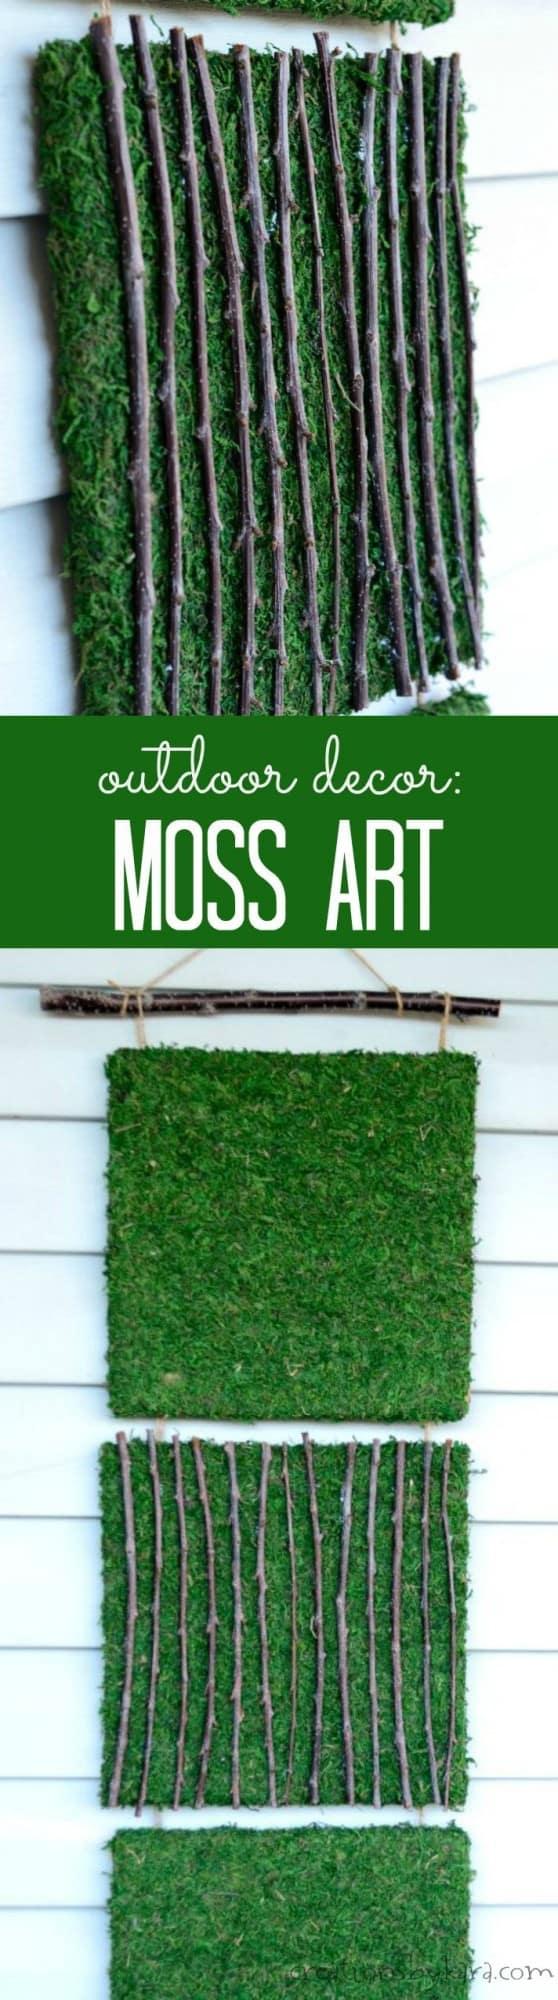 Outdoor decor diy - Outdoor Decor Moss Art Tutoriial